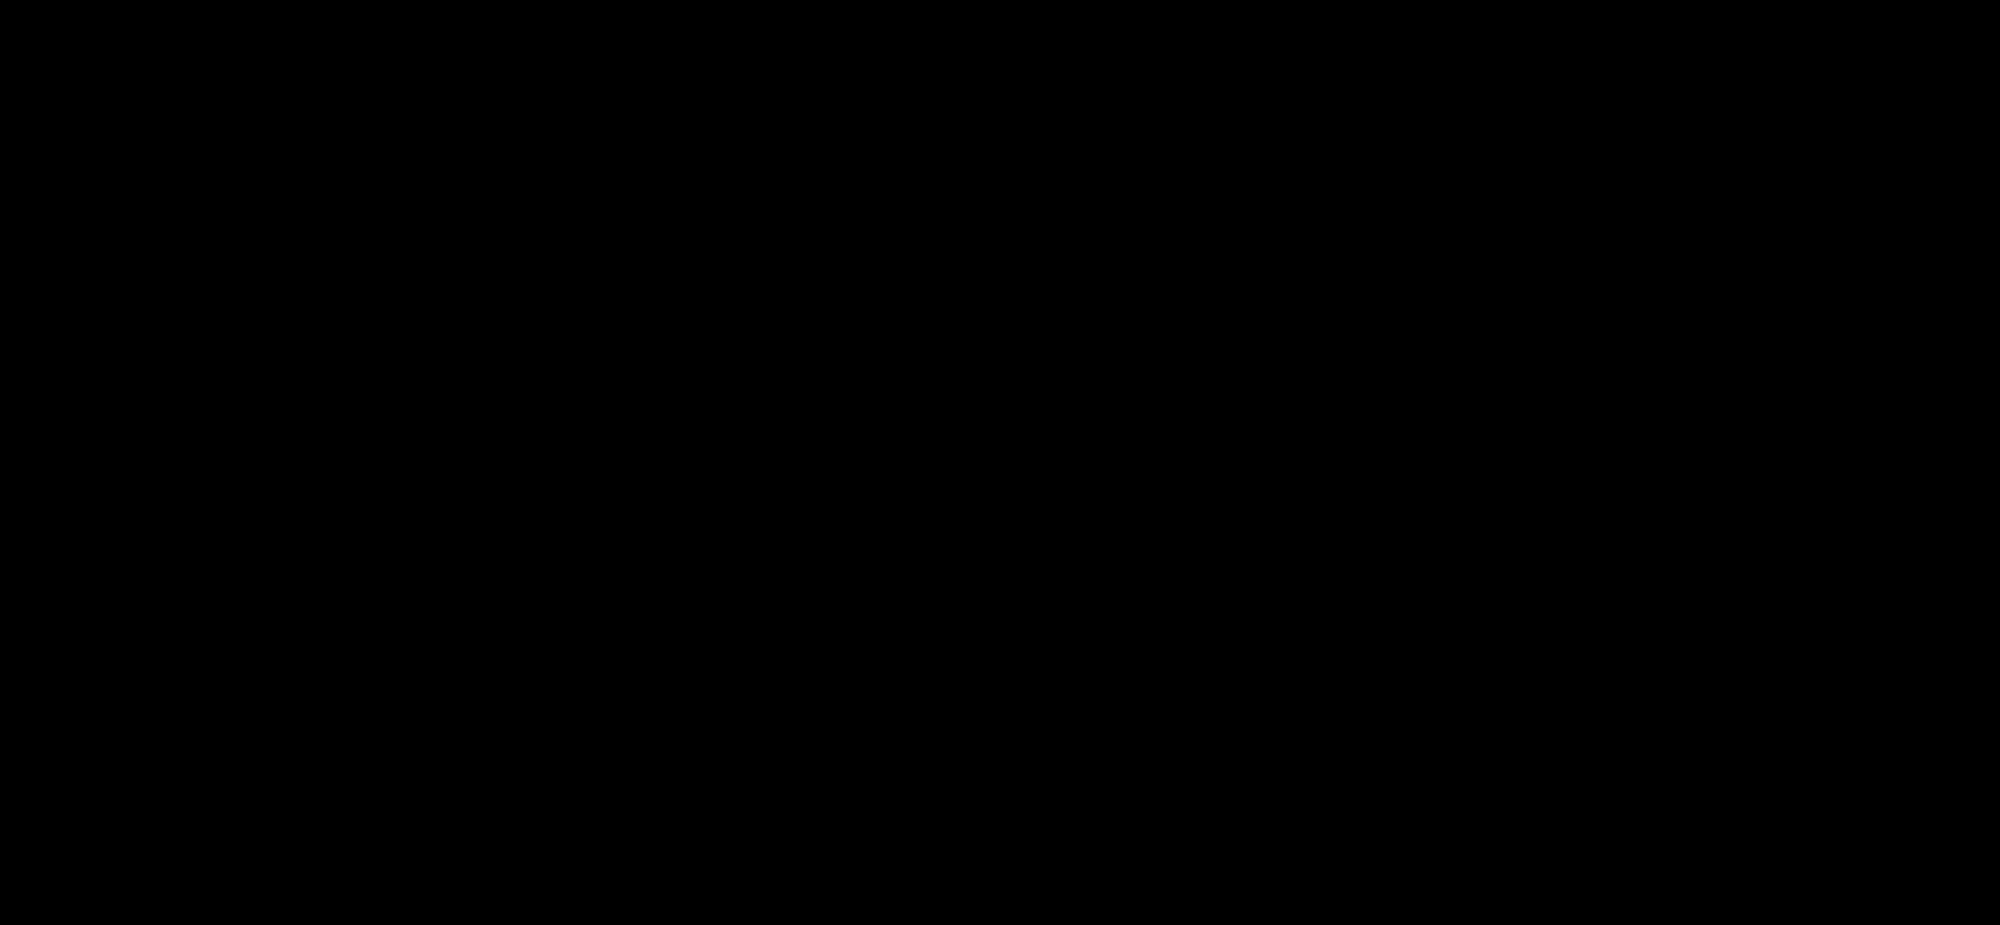 freiheitsfoo Wiki | Main / 32C3